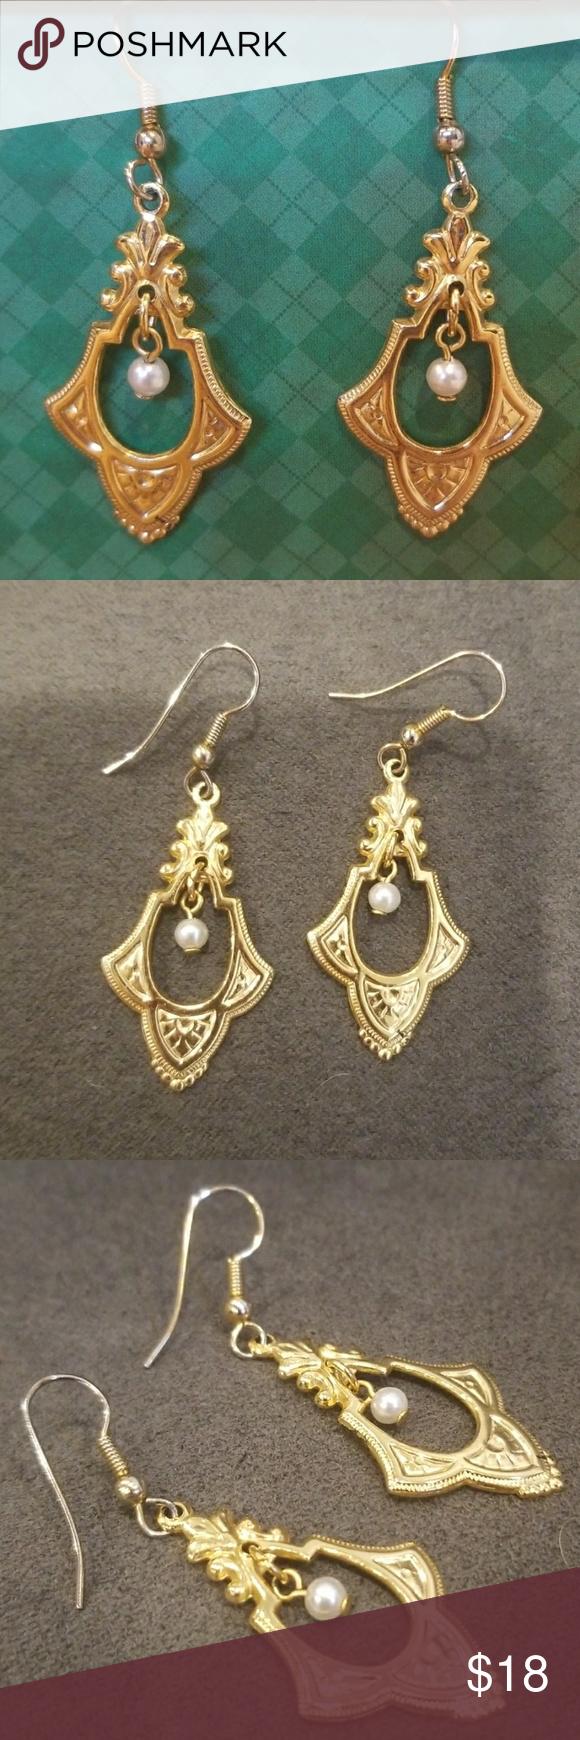 Sale Vintage Fashion Earrings Fashion Earrings Vintage Fashion Vintage Jewelry Earrings